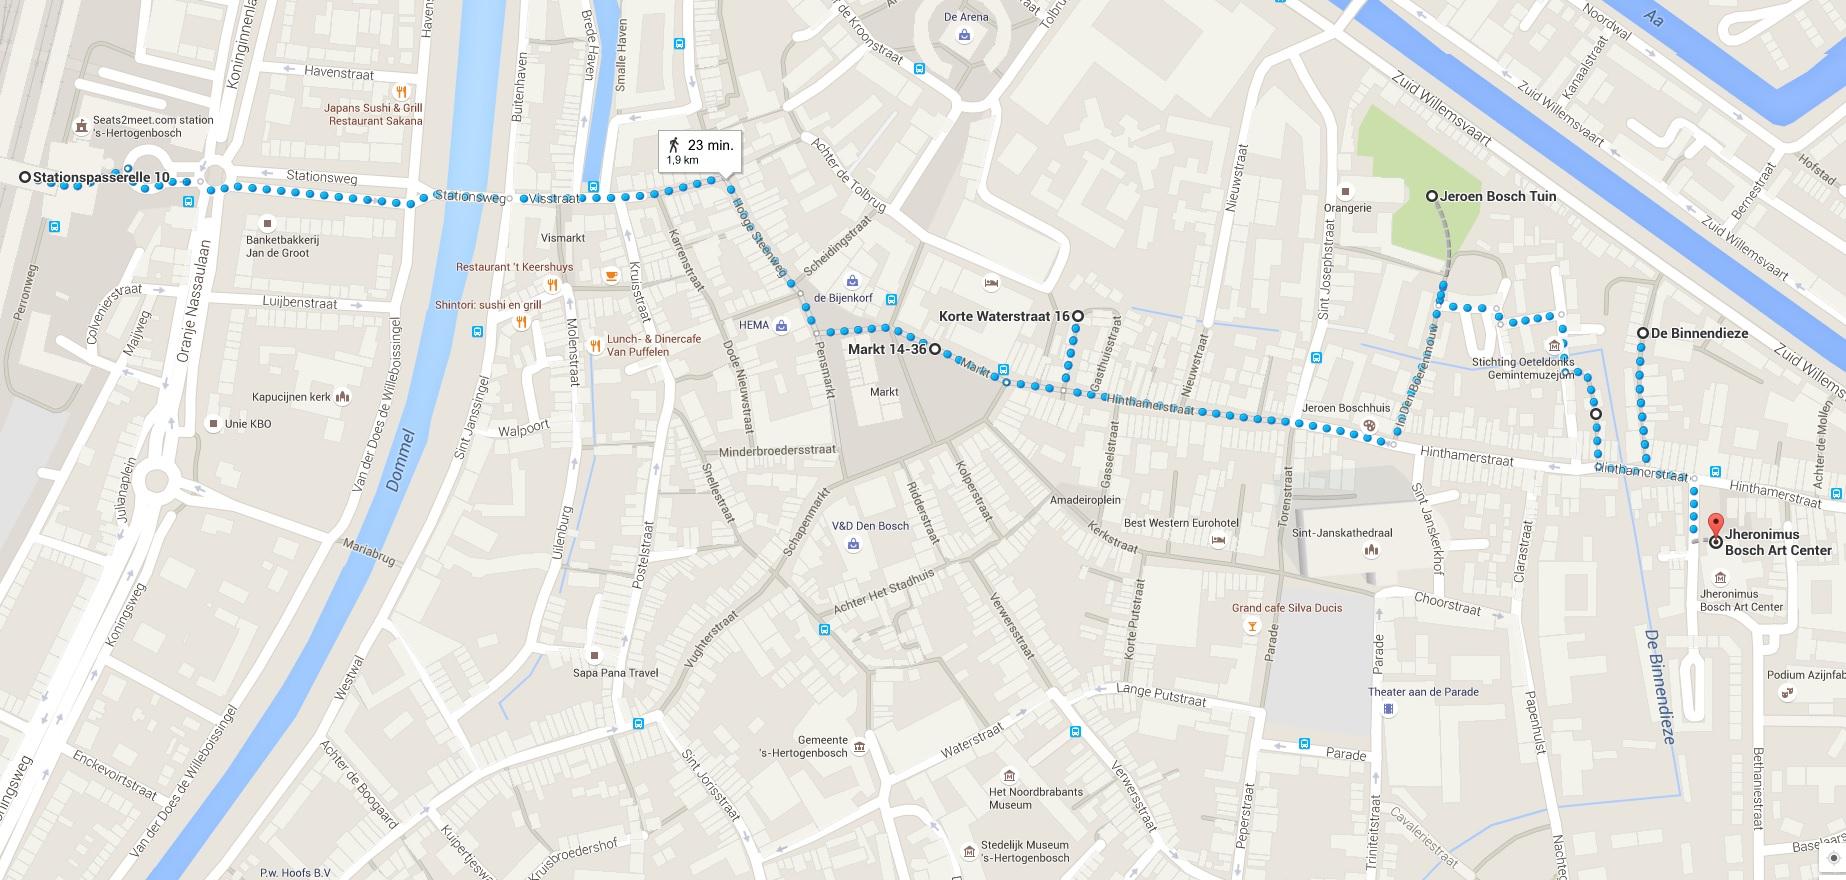 Stadswandeling Jeroen Bosch 1 - Den Bosch Tips